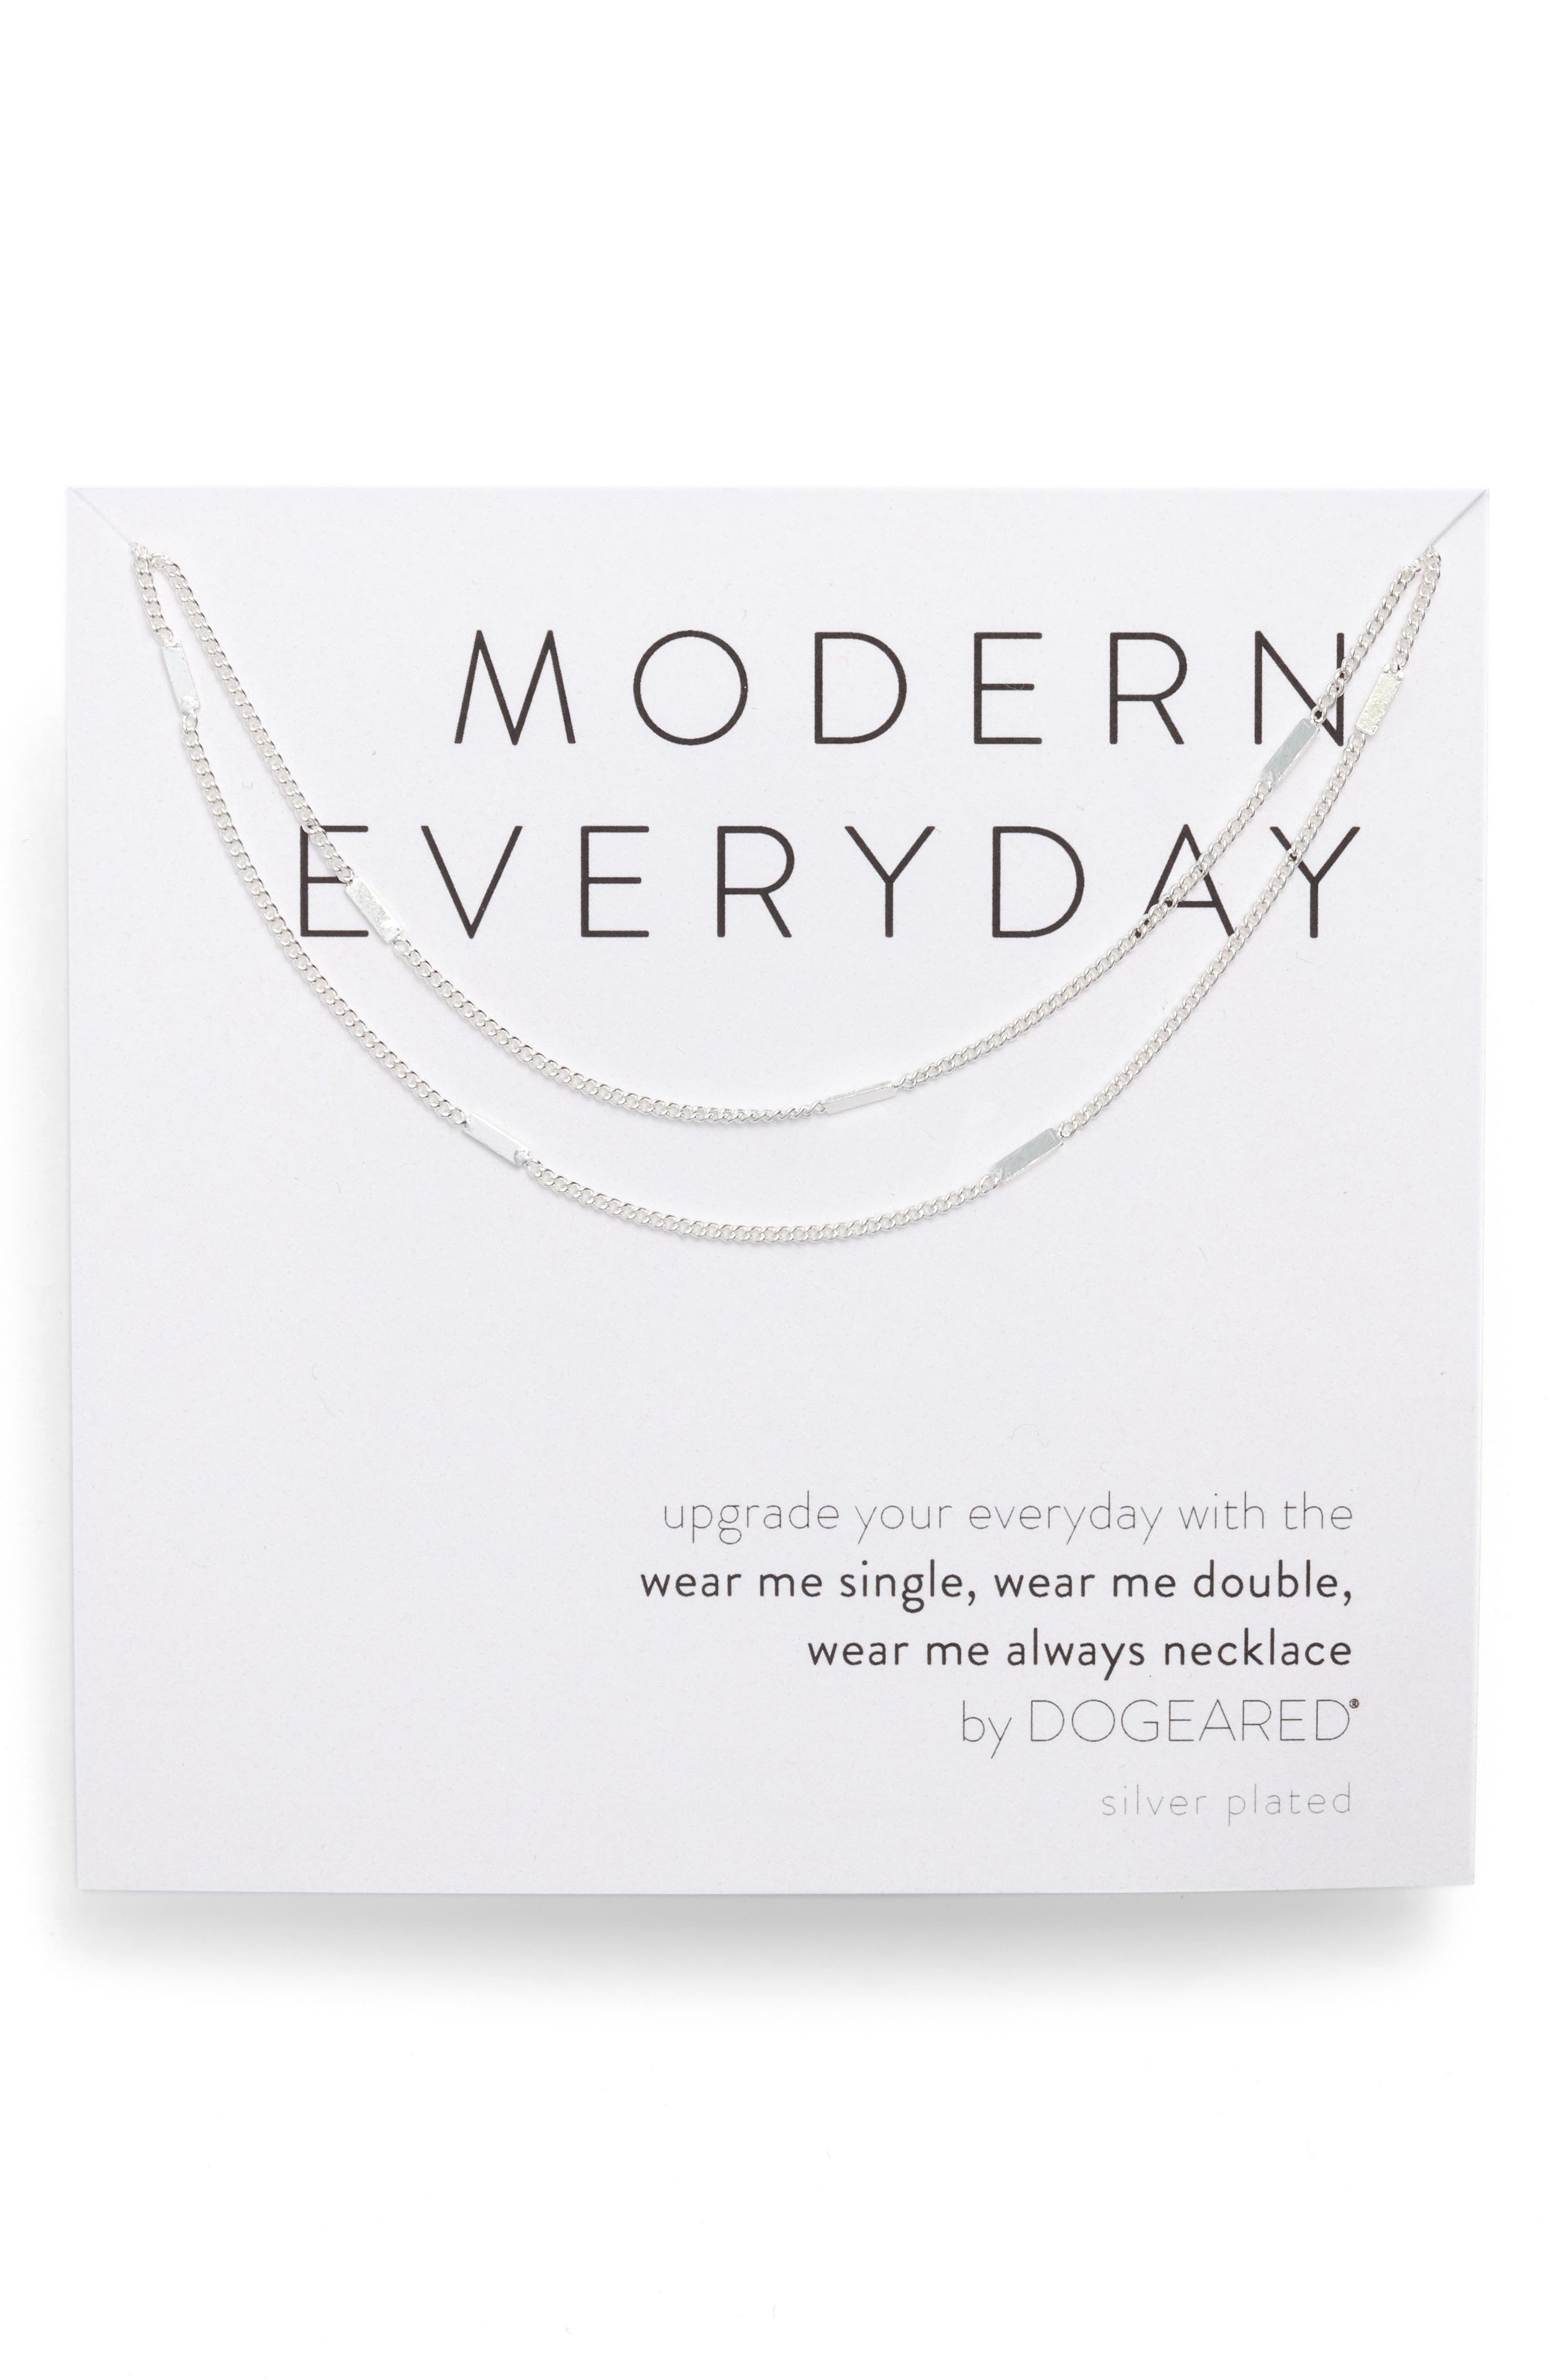 DOGEARED Modern Everyday Wear Me Necklace in Silver